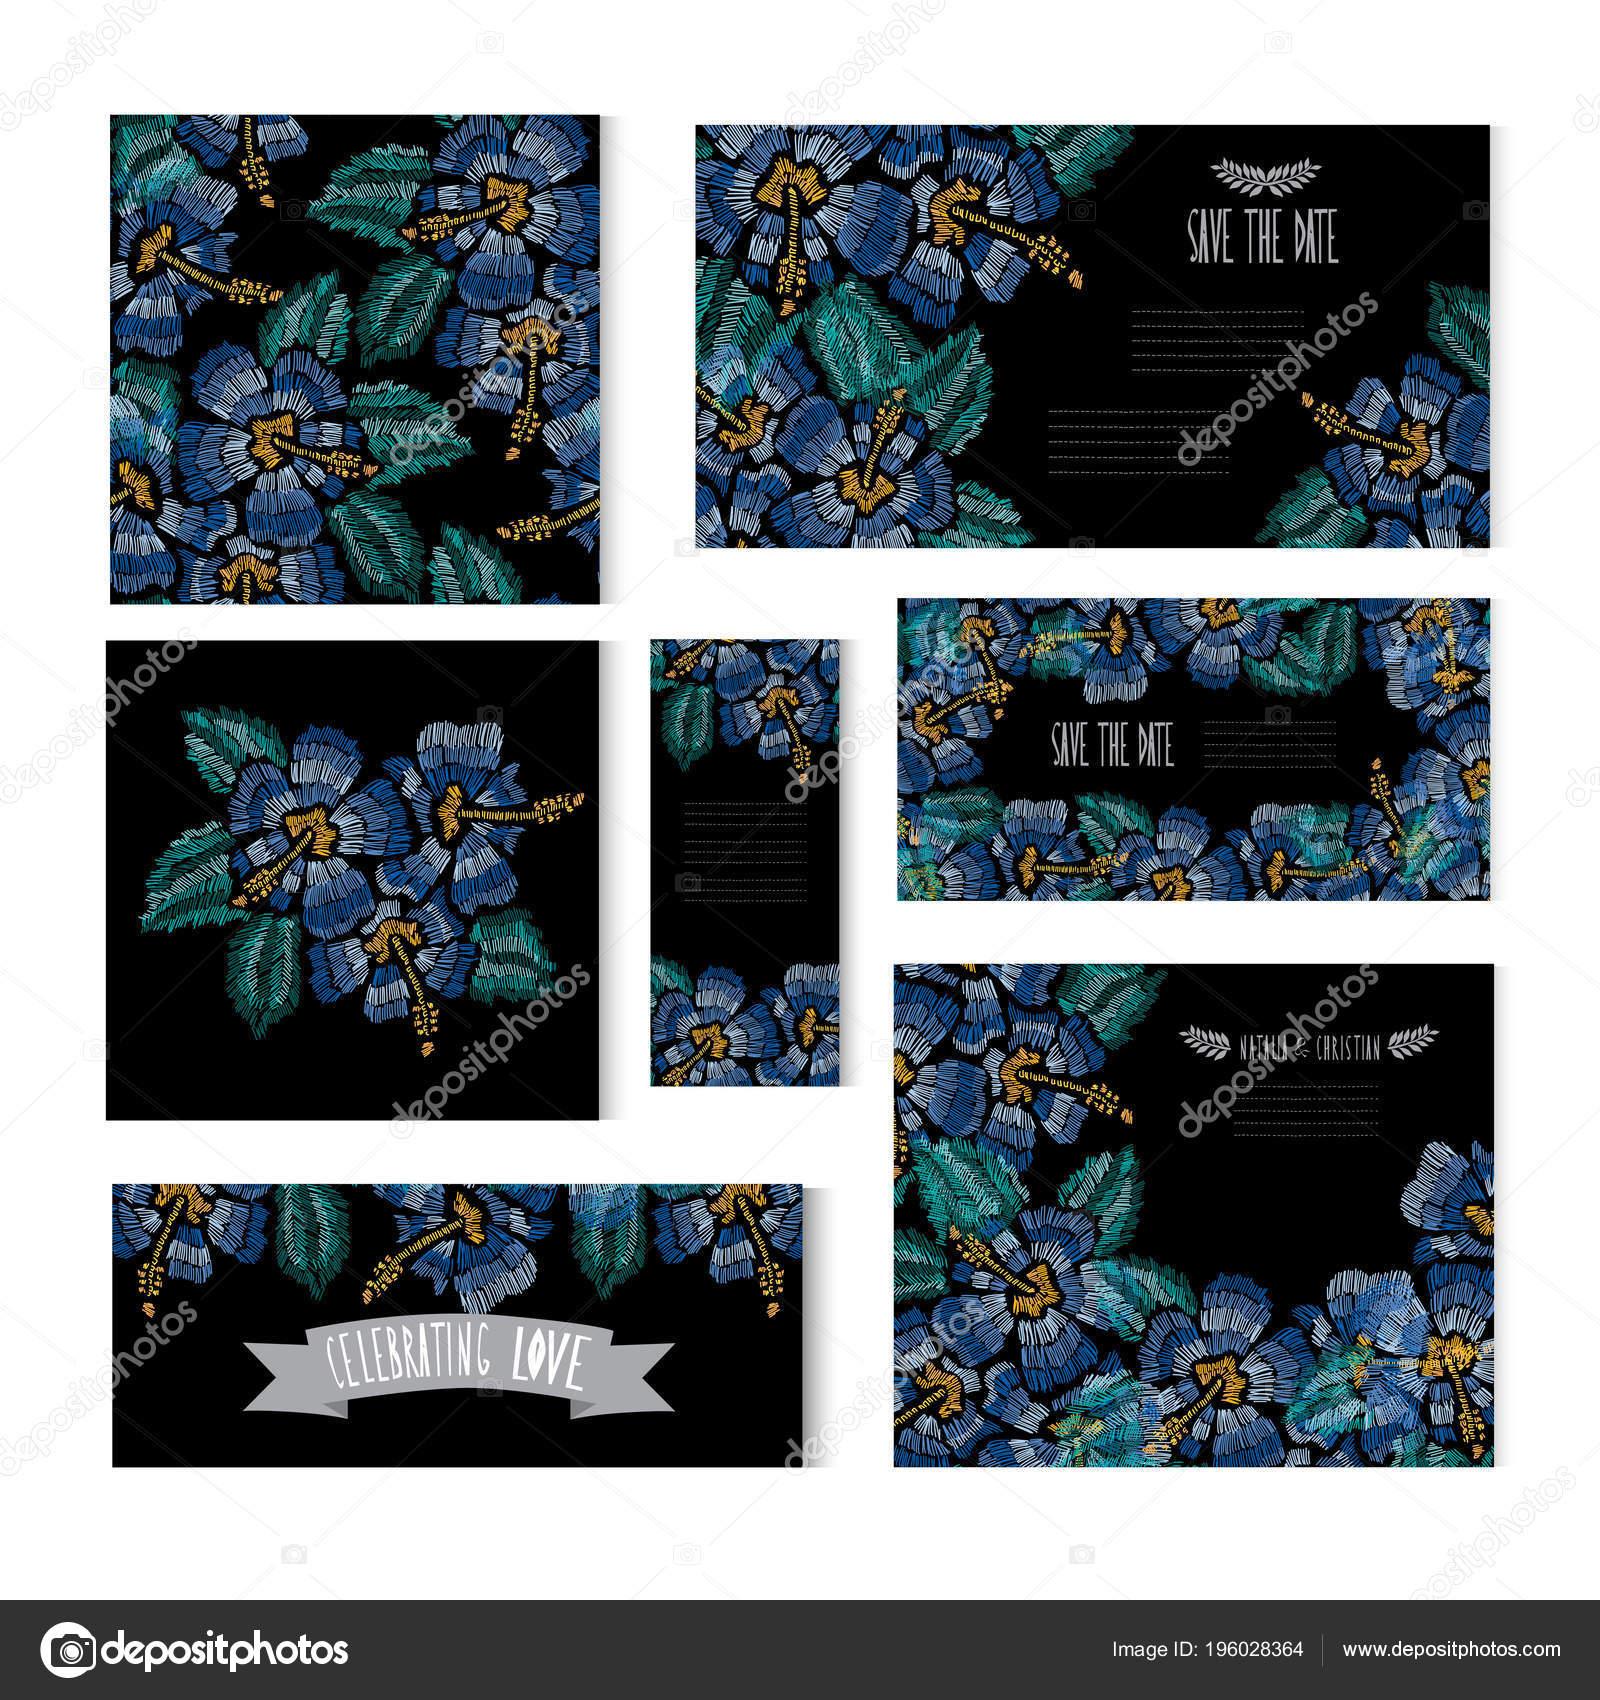 Elegant Cards Decorative Hibiscus Flowers Design Elements Can Used